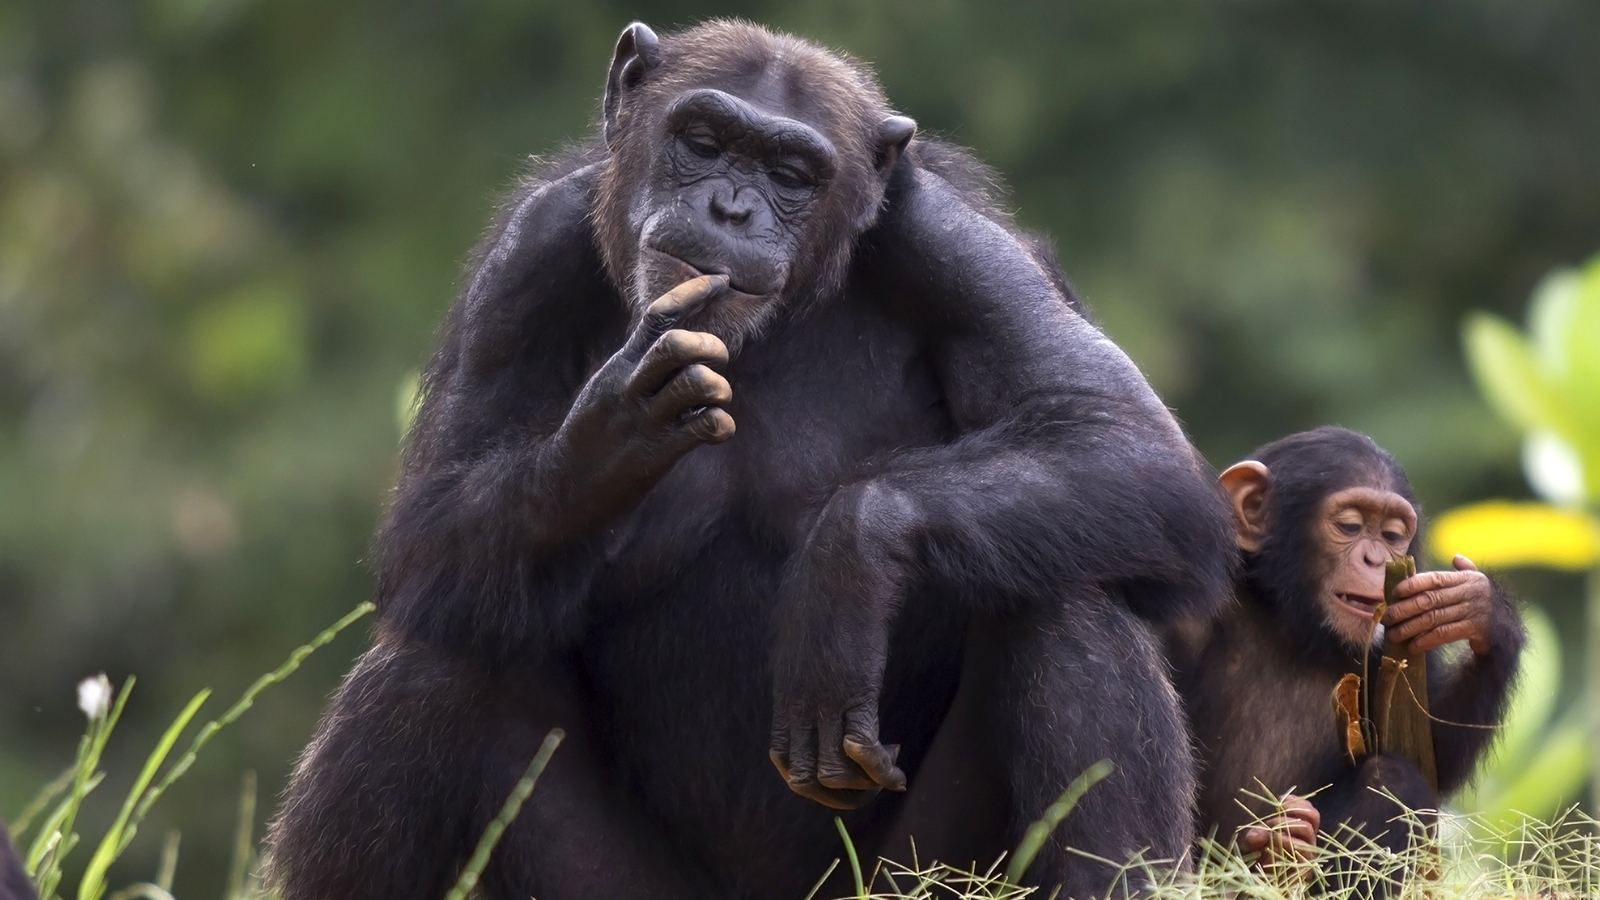 Black Chimpanzee Image